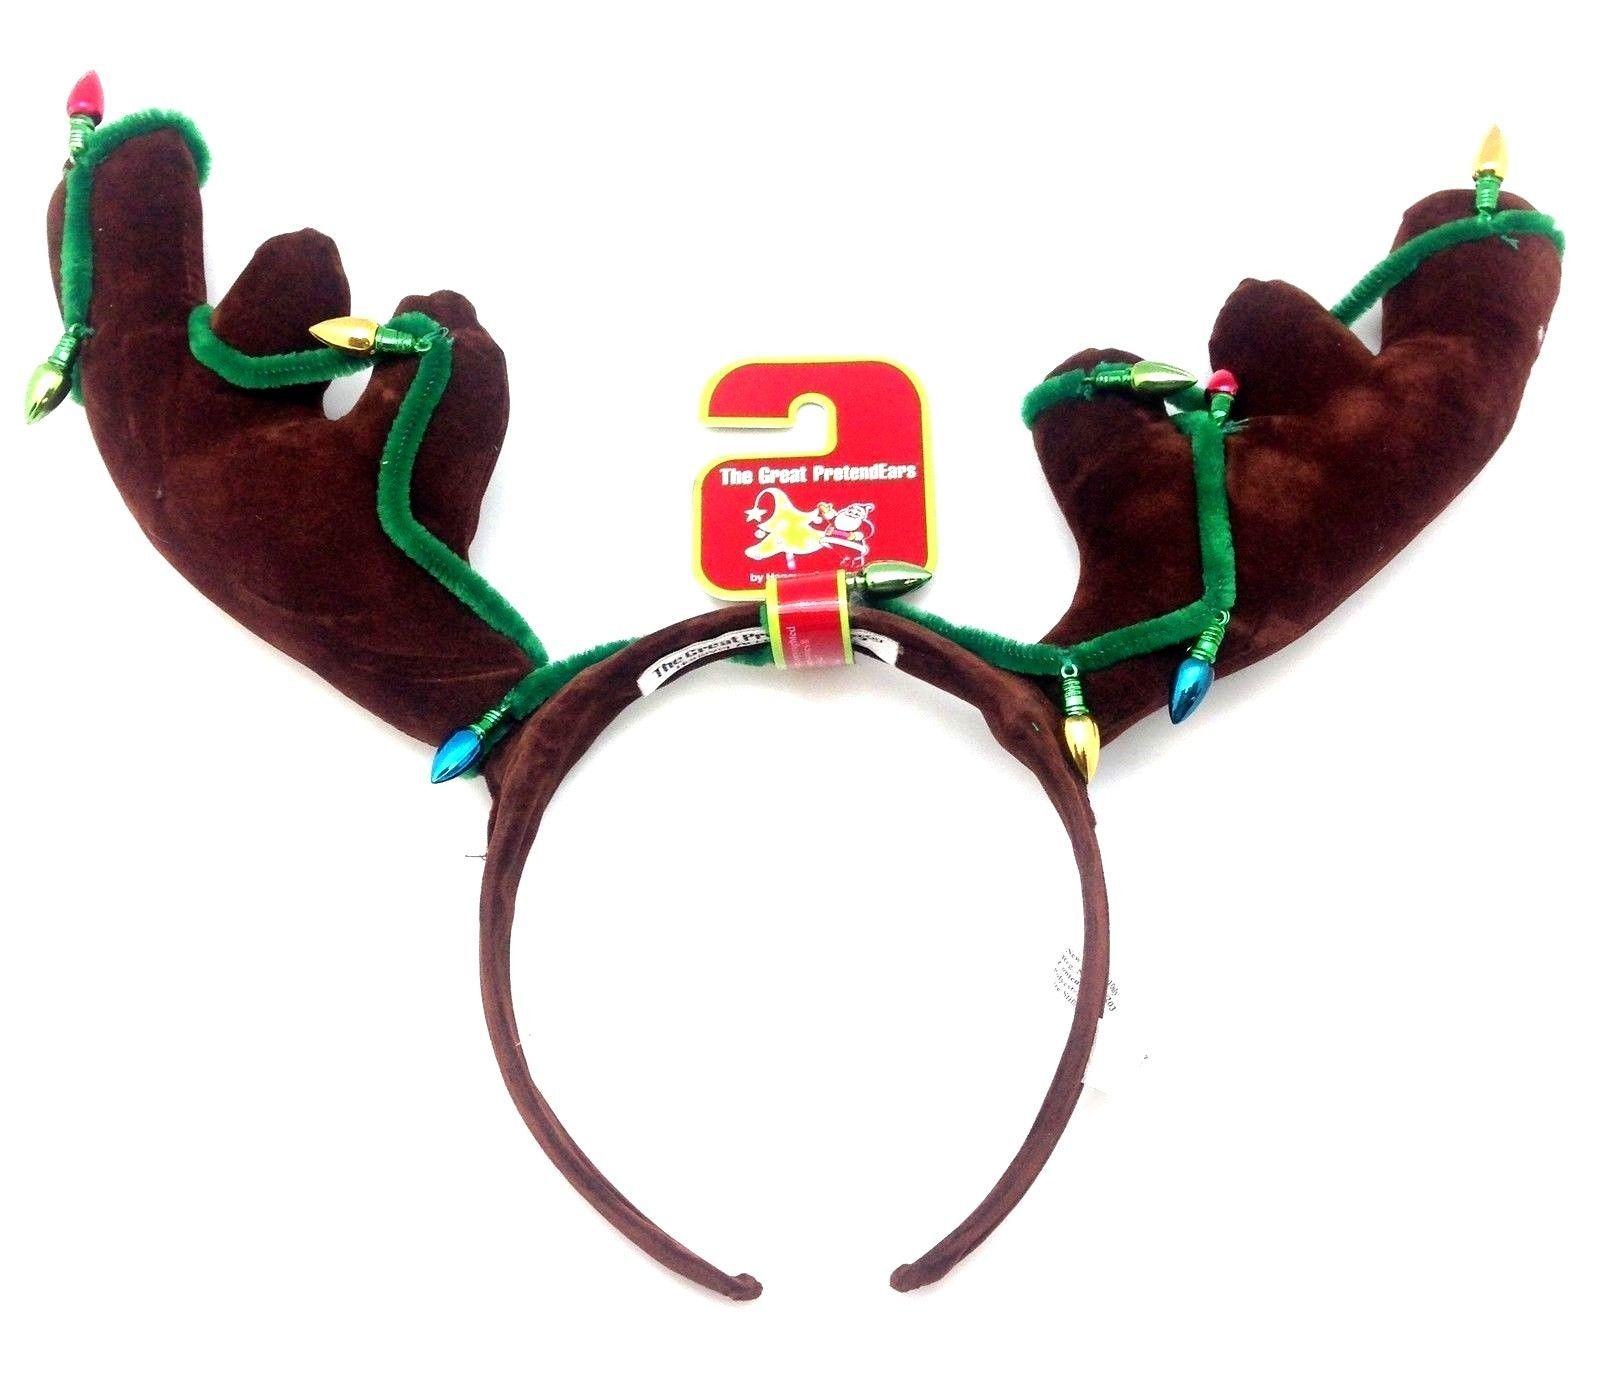 Reindeer X-Mas Headband Costume Dress Up PretendEars Fun Party Bow Antler Hat